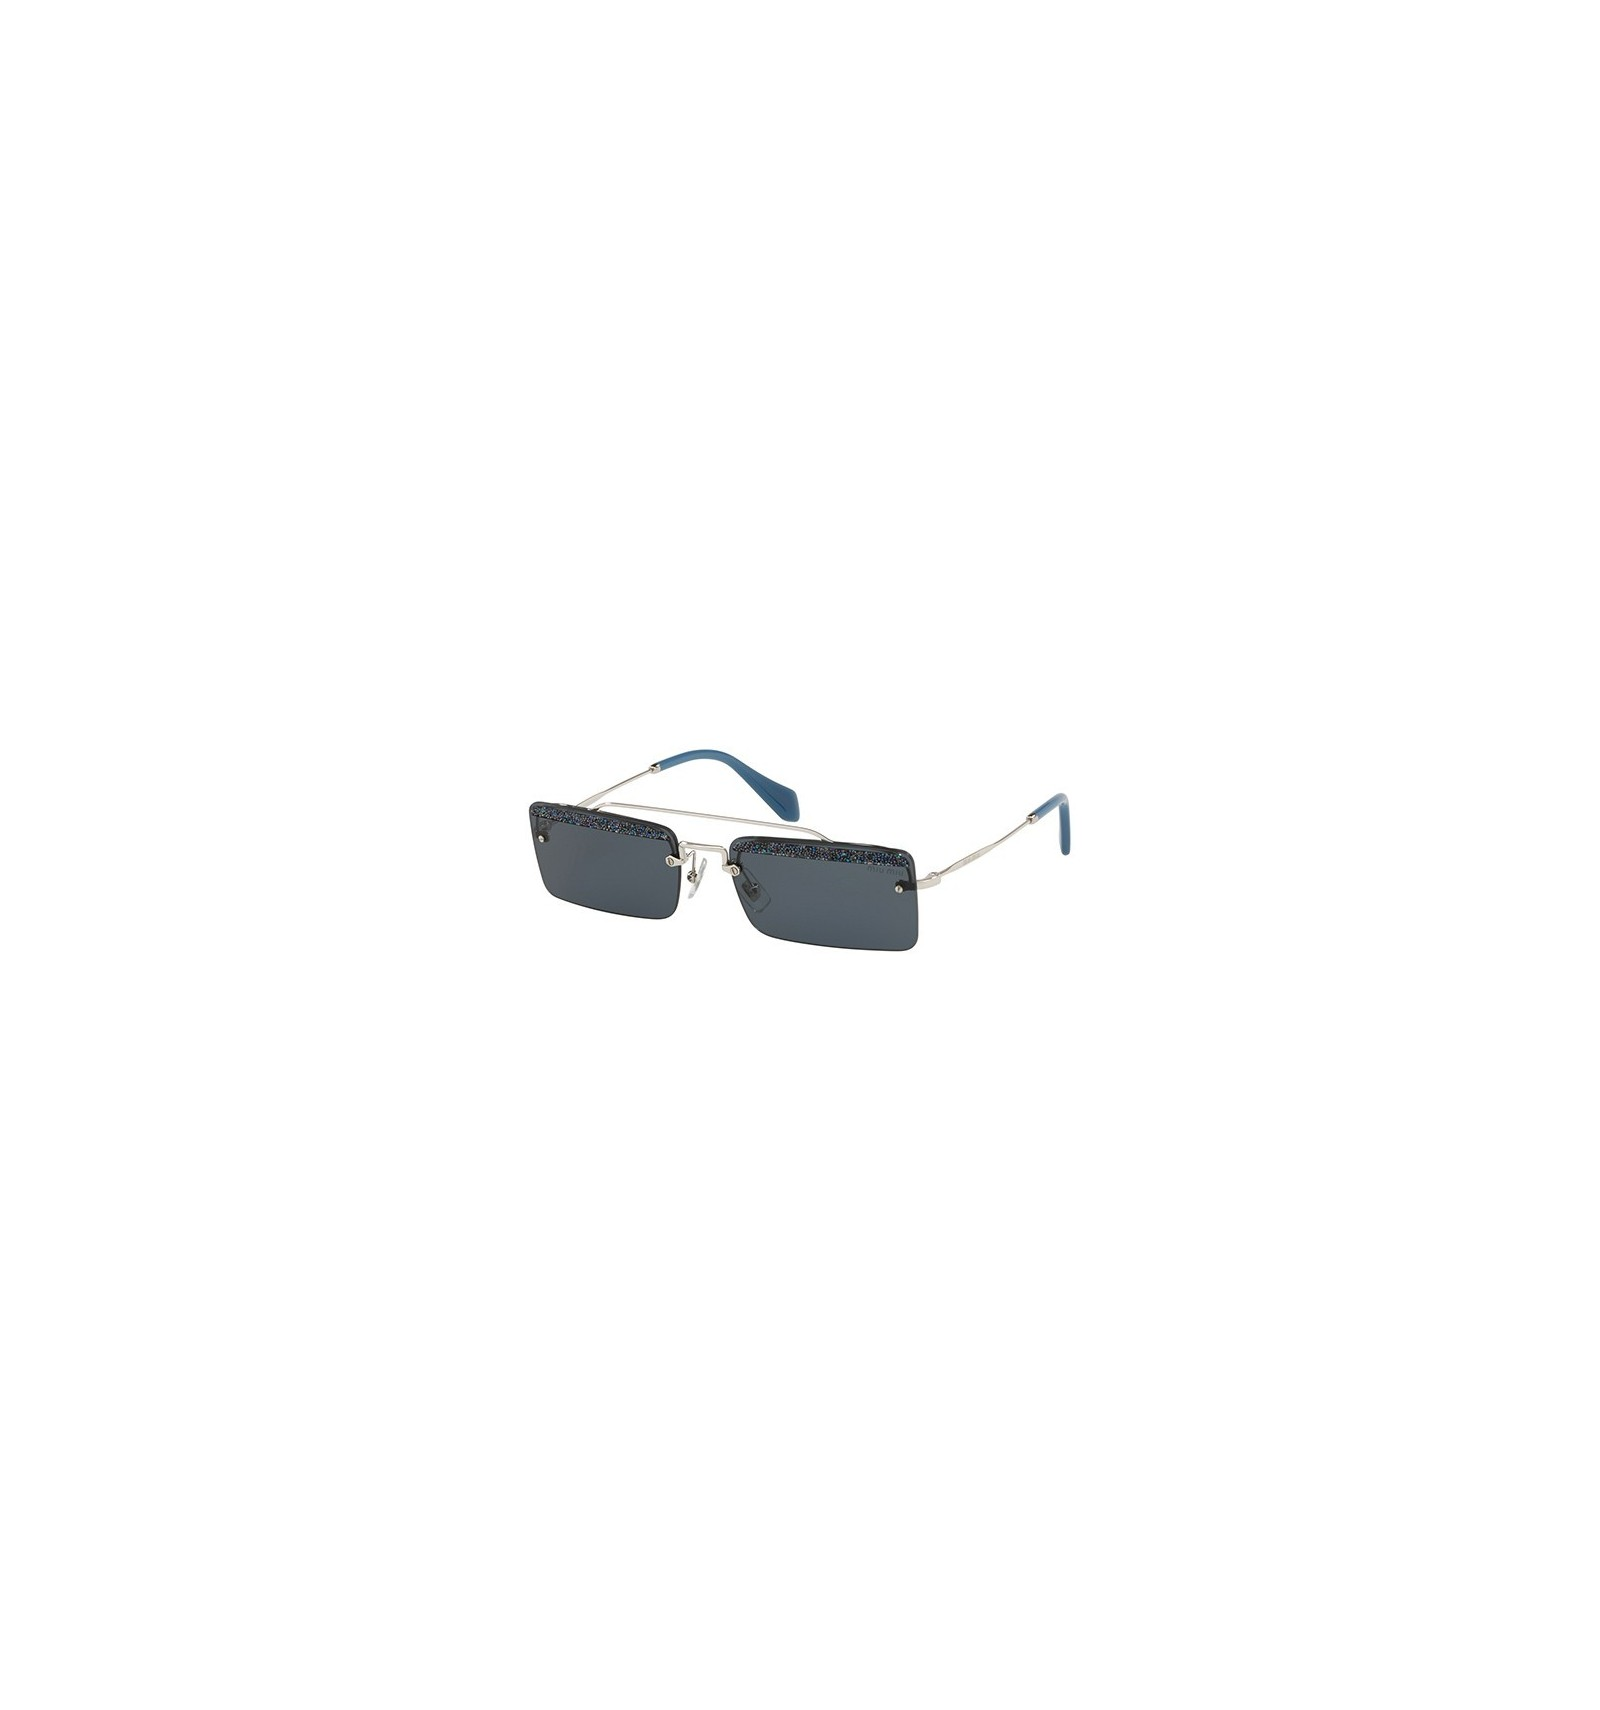 8c16298d56 Gafas de sol MIU MIU SMU59T SOCIETE Silver - Grey Blue Glitter (KJT-2K1